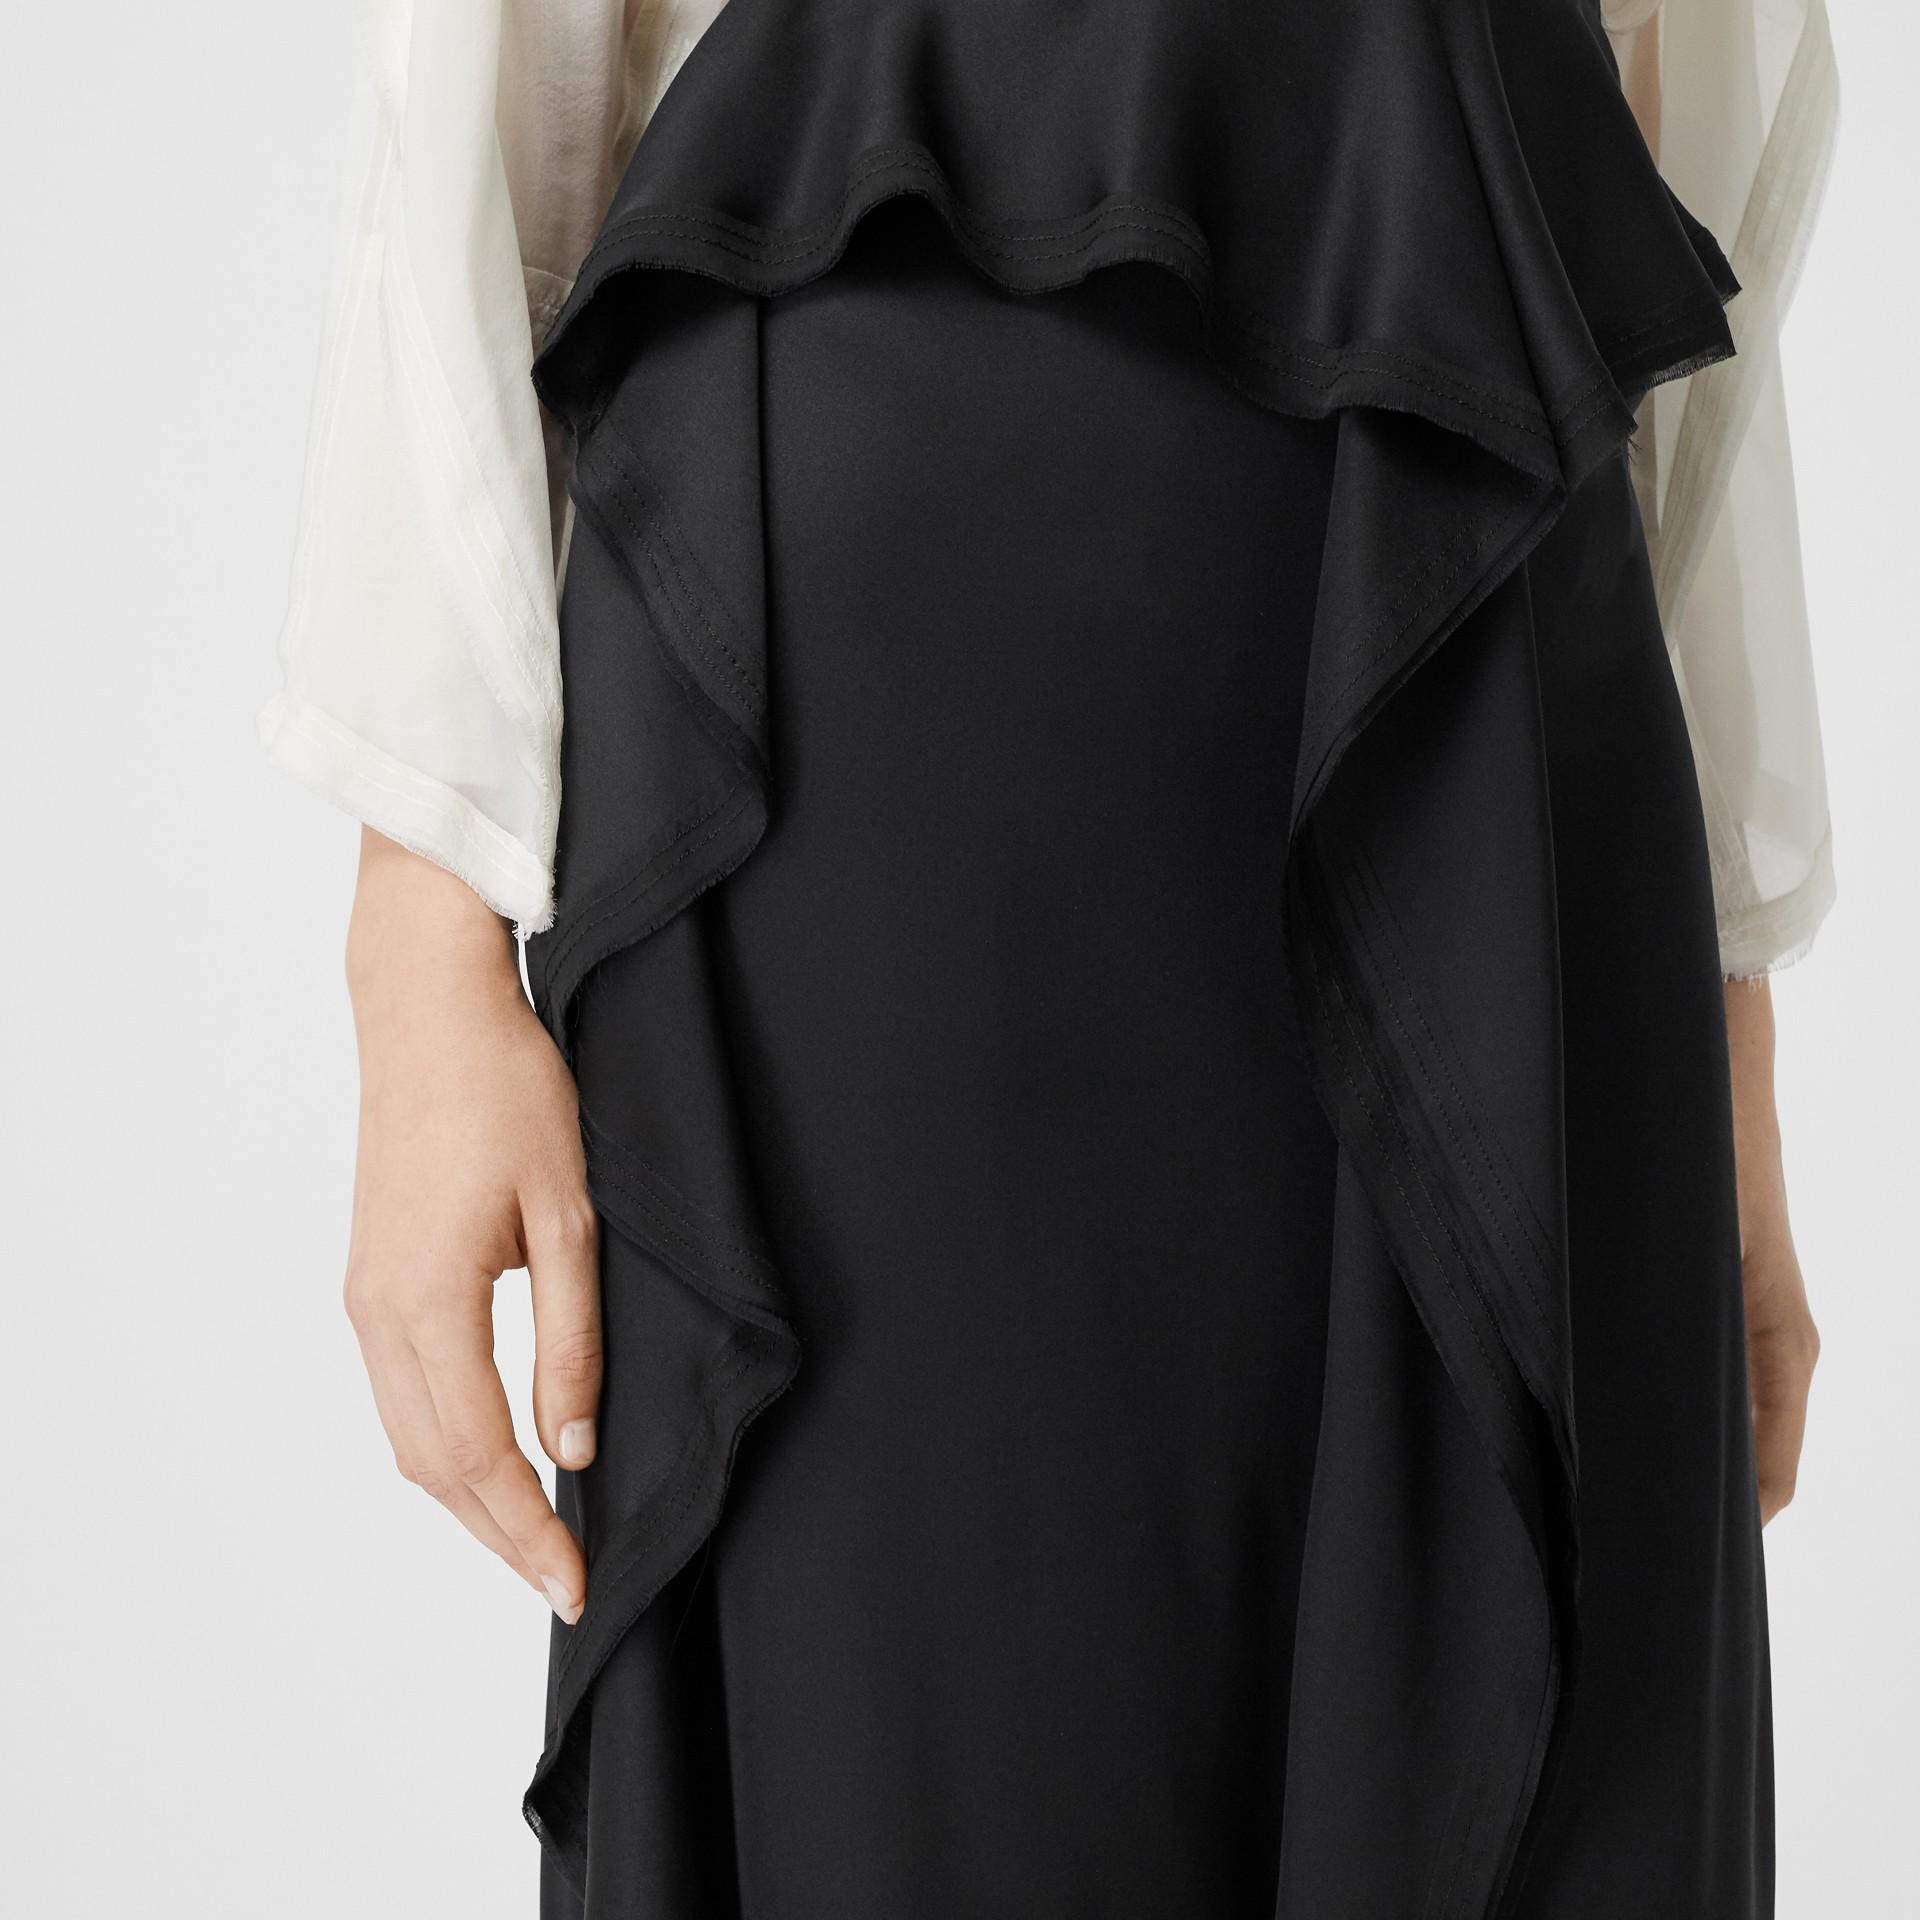 Ruffle Detail Silk Satin Pencil Skirt in Black - Women | Burberry United Kingdom - gallery image 1